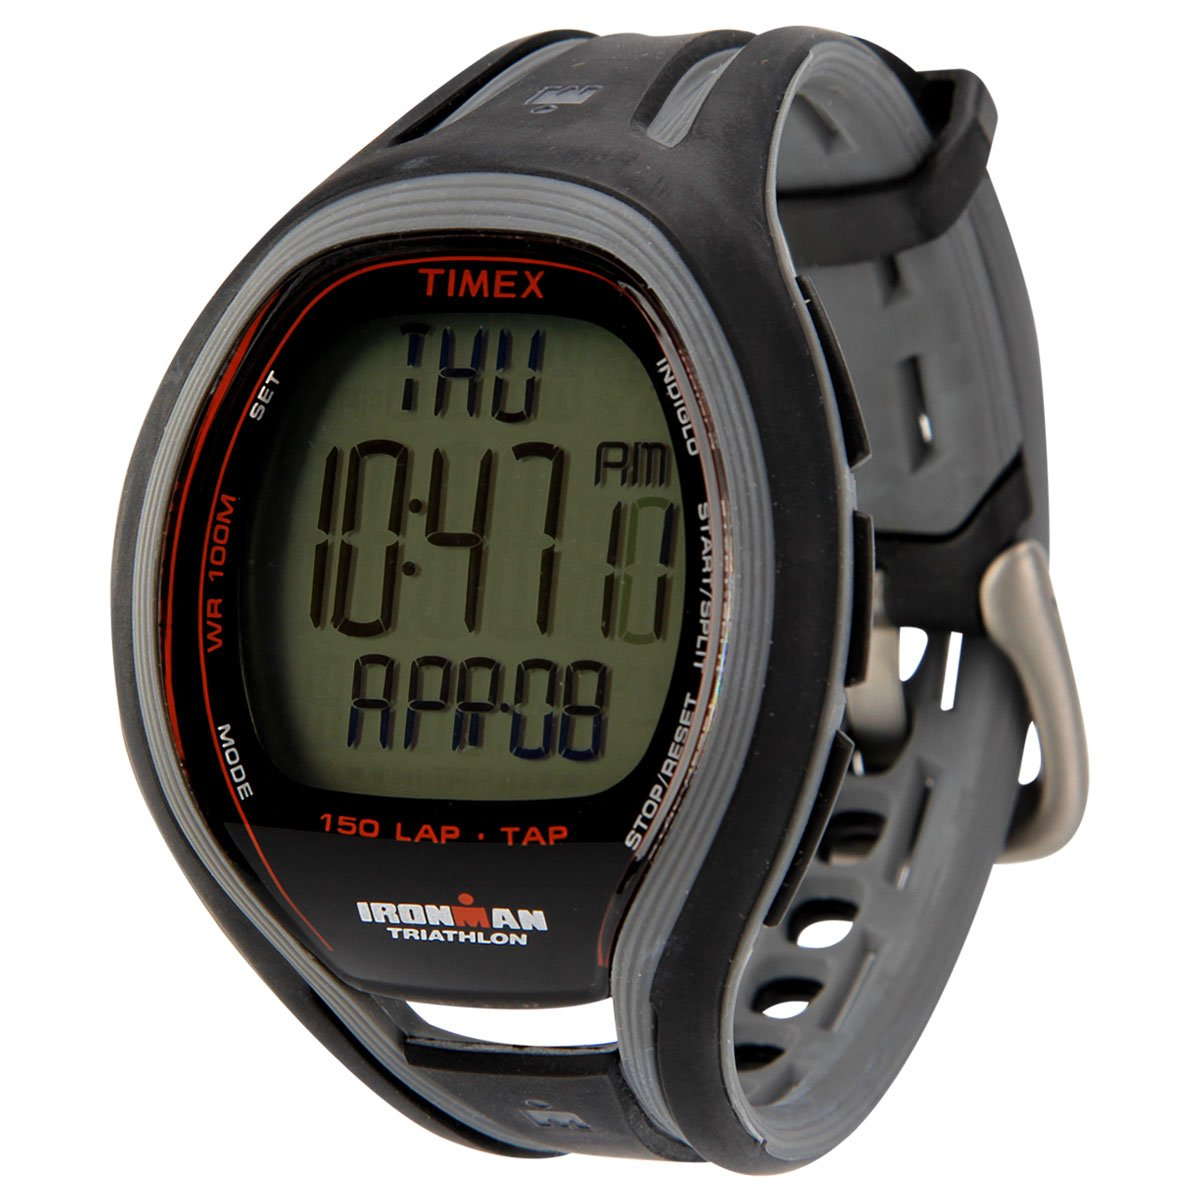 a113d0f6fca Relógio Timex Ironman Sleek 150 Lap T5K25 - Compre Agora